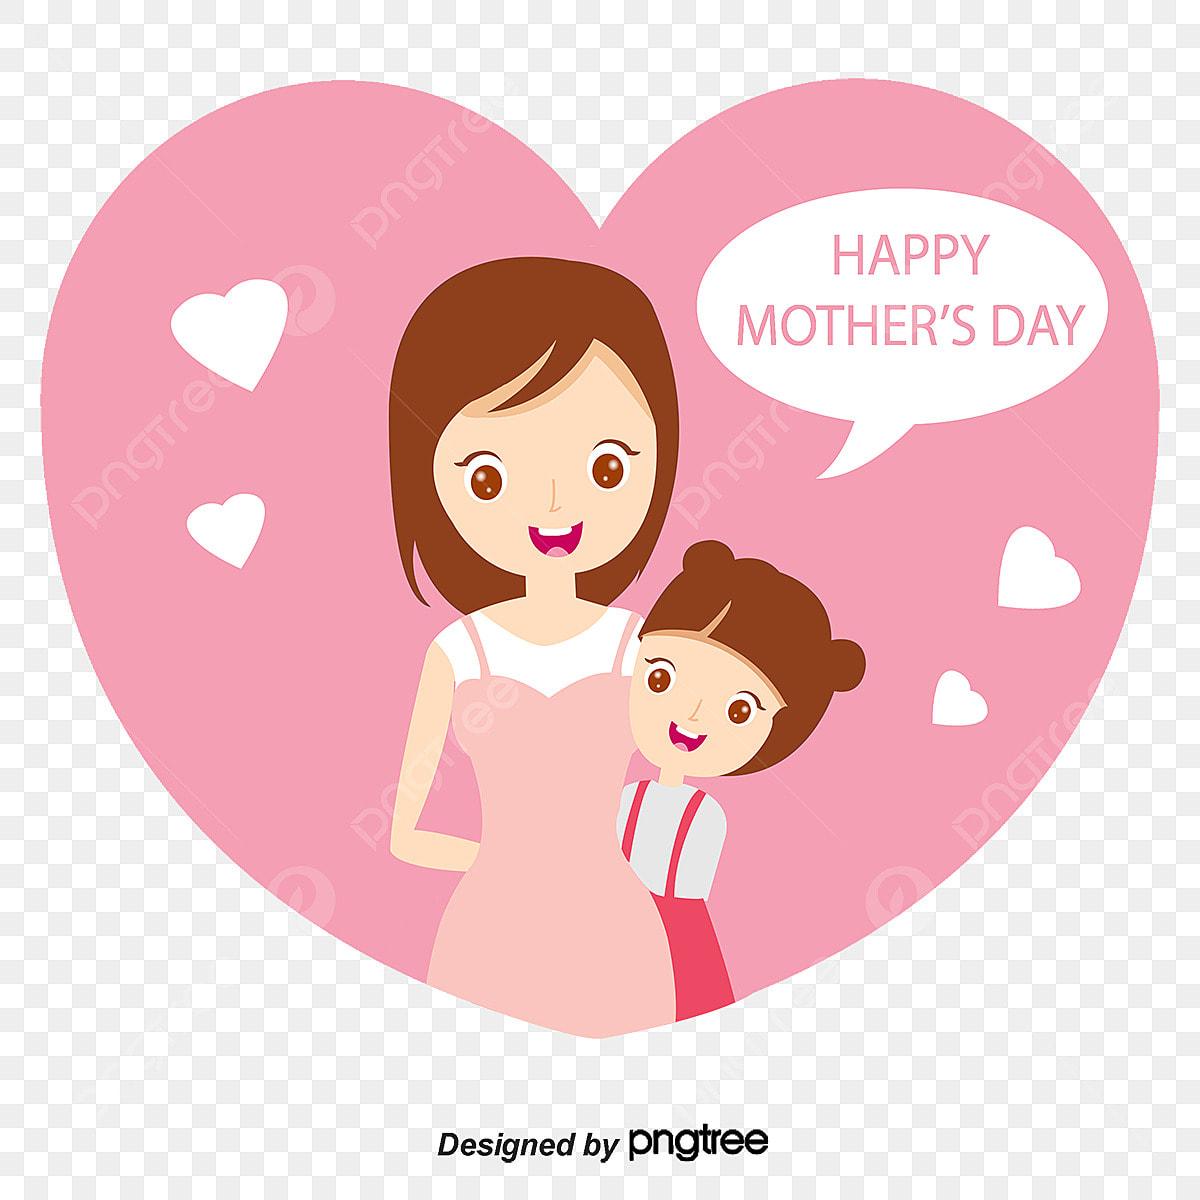 Untuk Tersayang Ibu Bahan Vektor Ibu Sayang Aku Suka Ibu